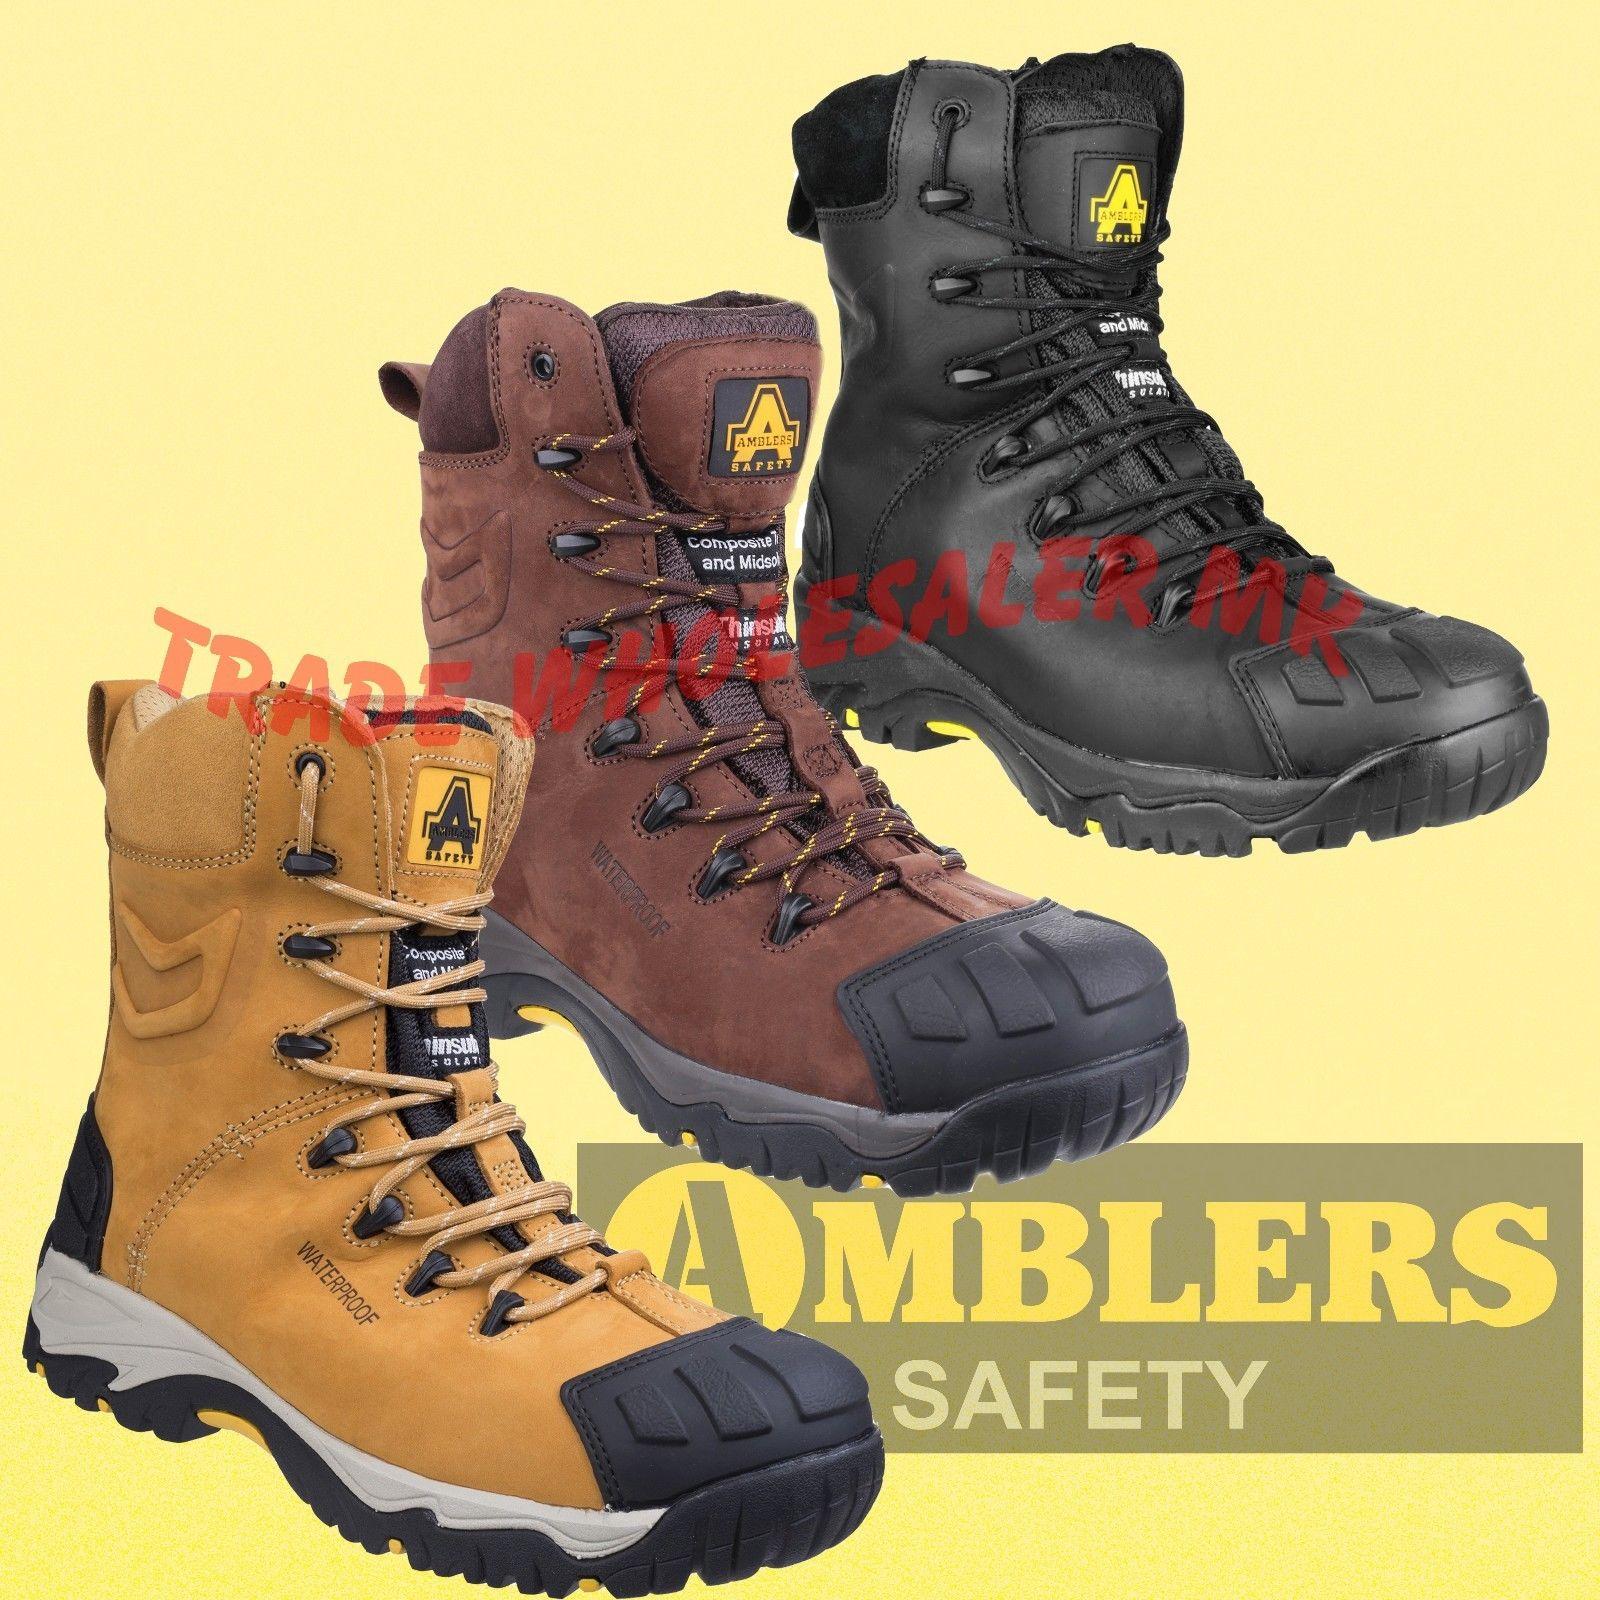 bde74b1a36d Amblers Safety Boots Waterproof, Honey, Black Brown -Zip Combat  FS995/998/999